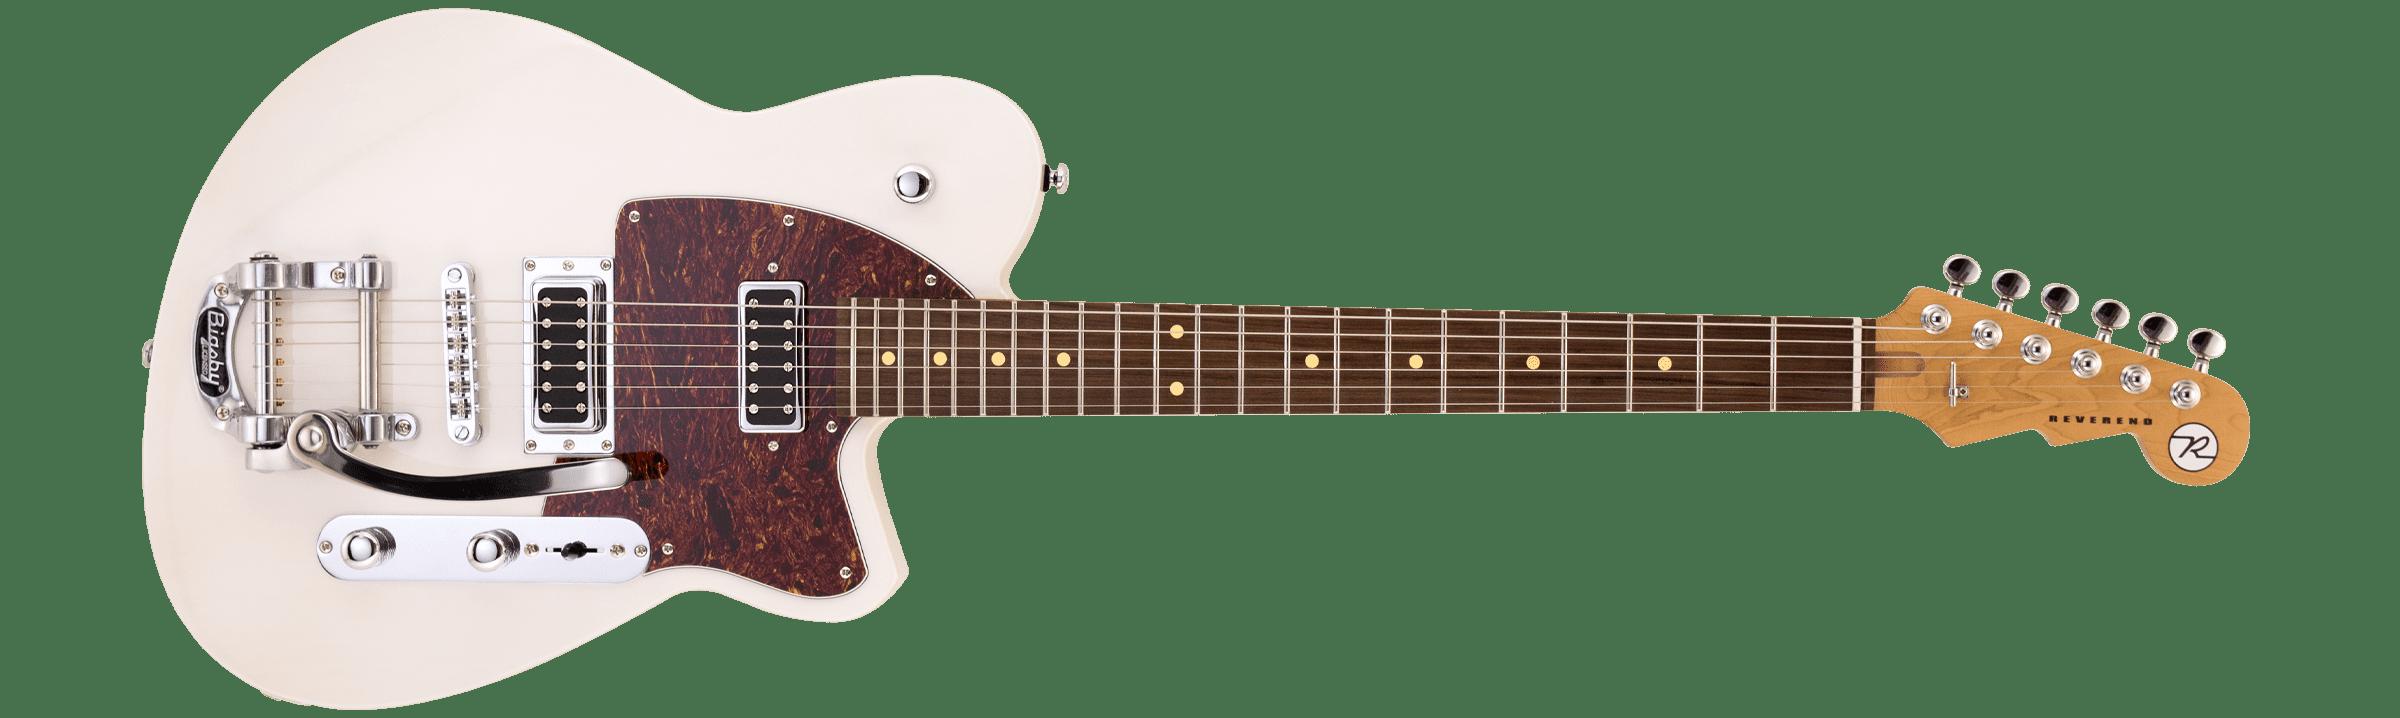 Reverend Guitars Updates the Flatroc